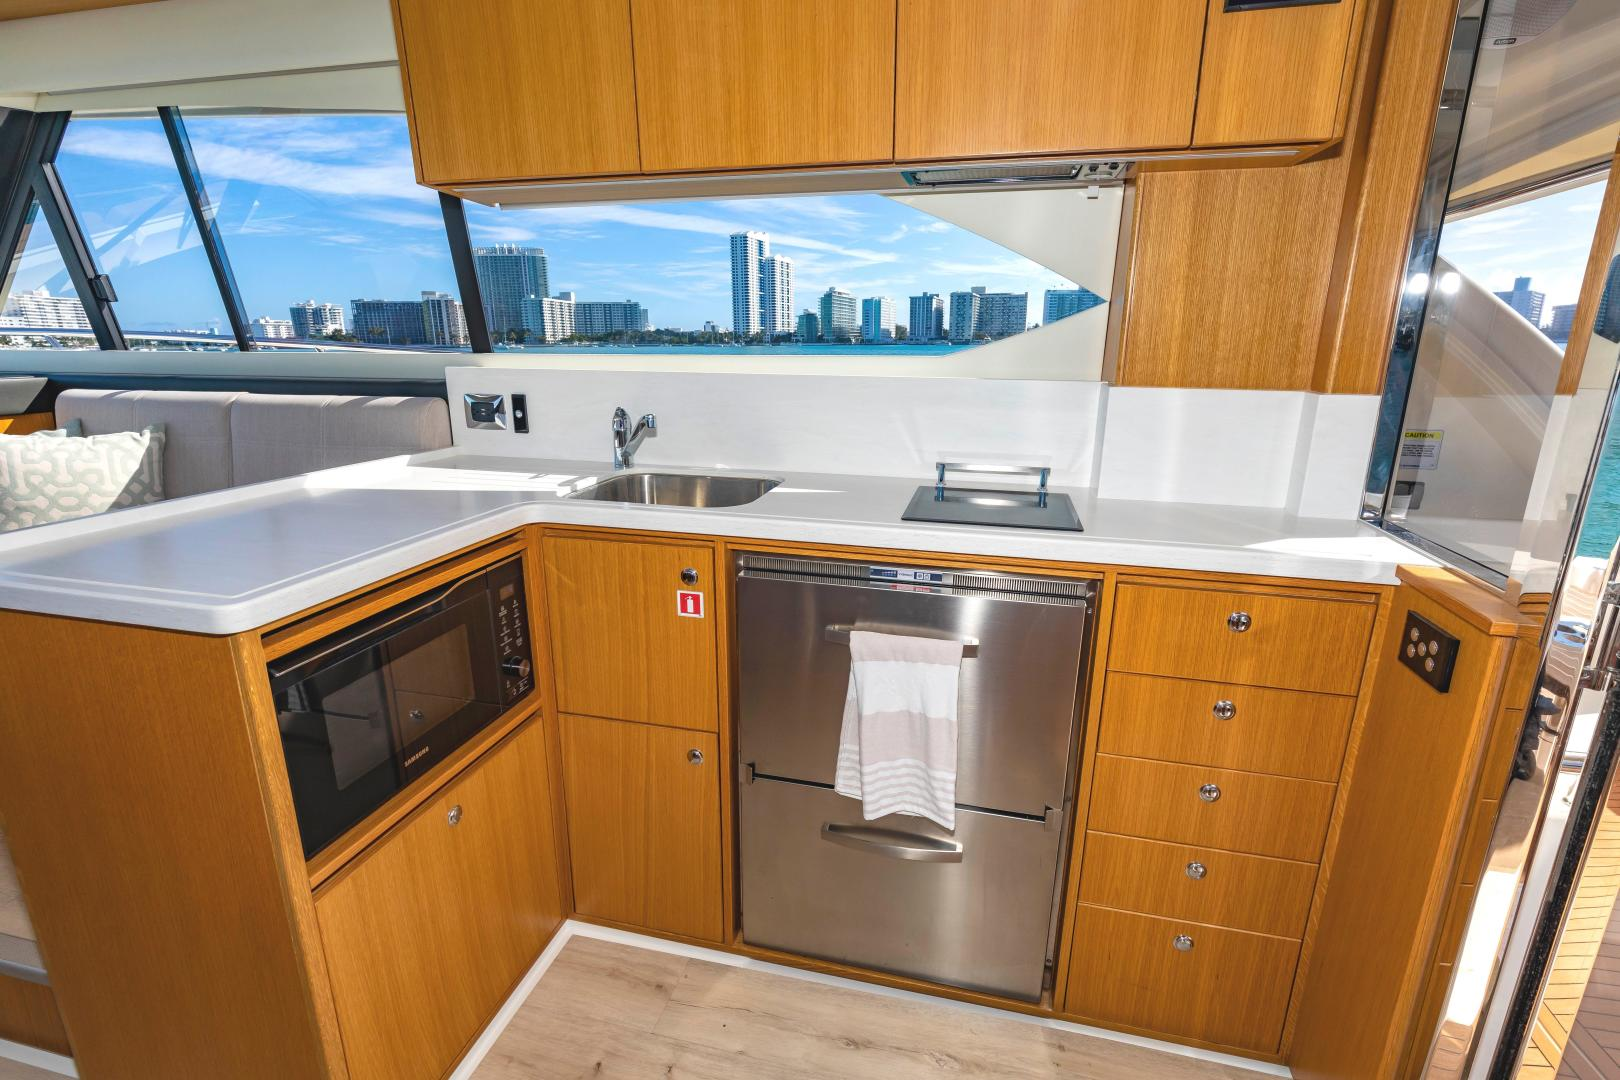 Riviera-395 SUV 2019-Ipanema Miami Beach-Florida-United States-1614901   Thumbnail